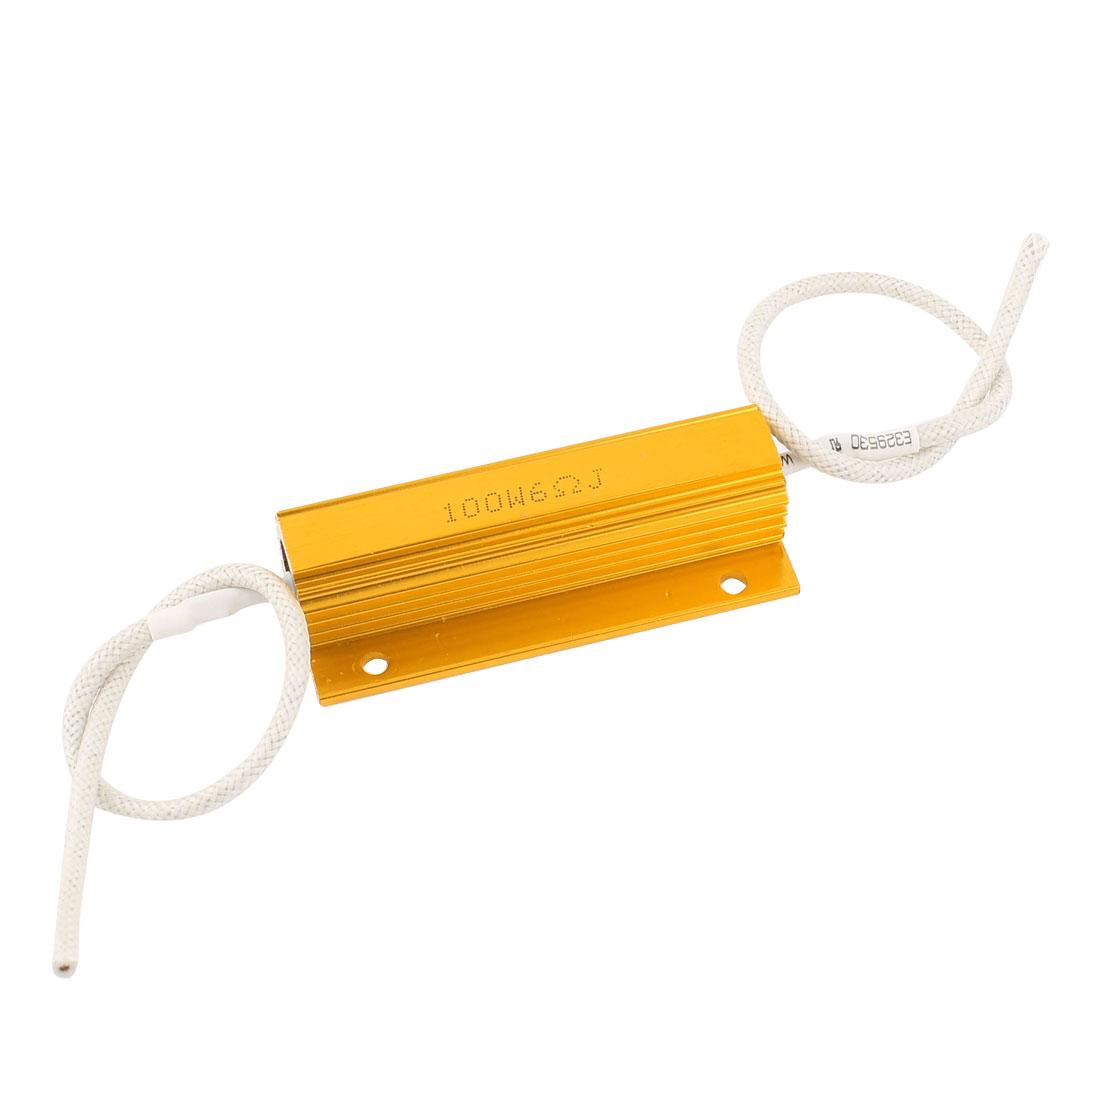 6Ohm 100W 5% Wirewound Car Loudspeaker Aluminum Clad Resistor